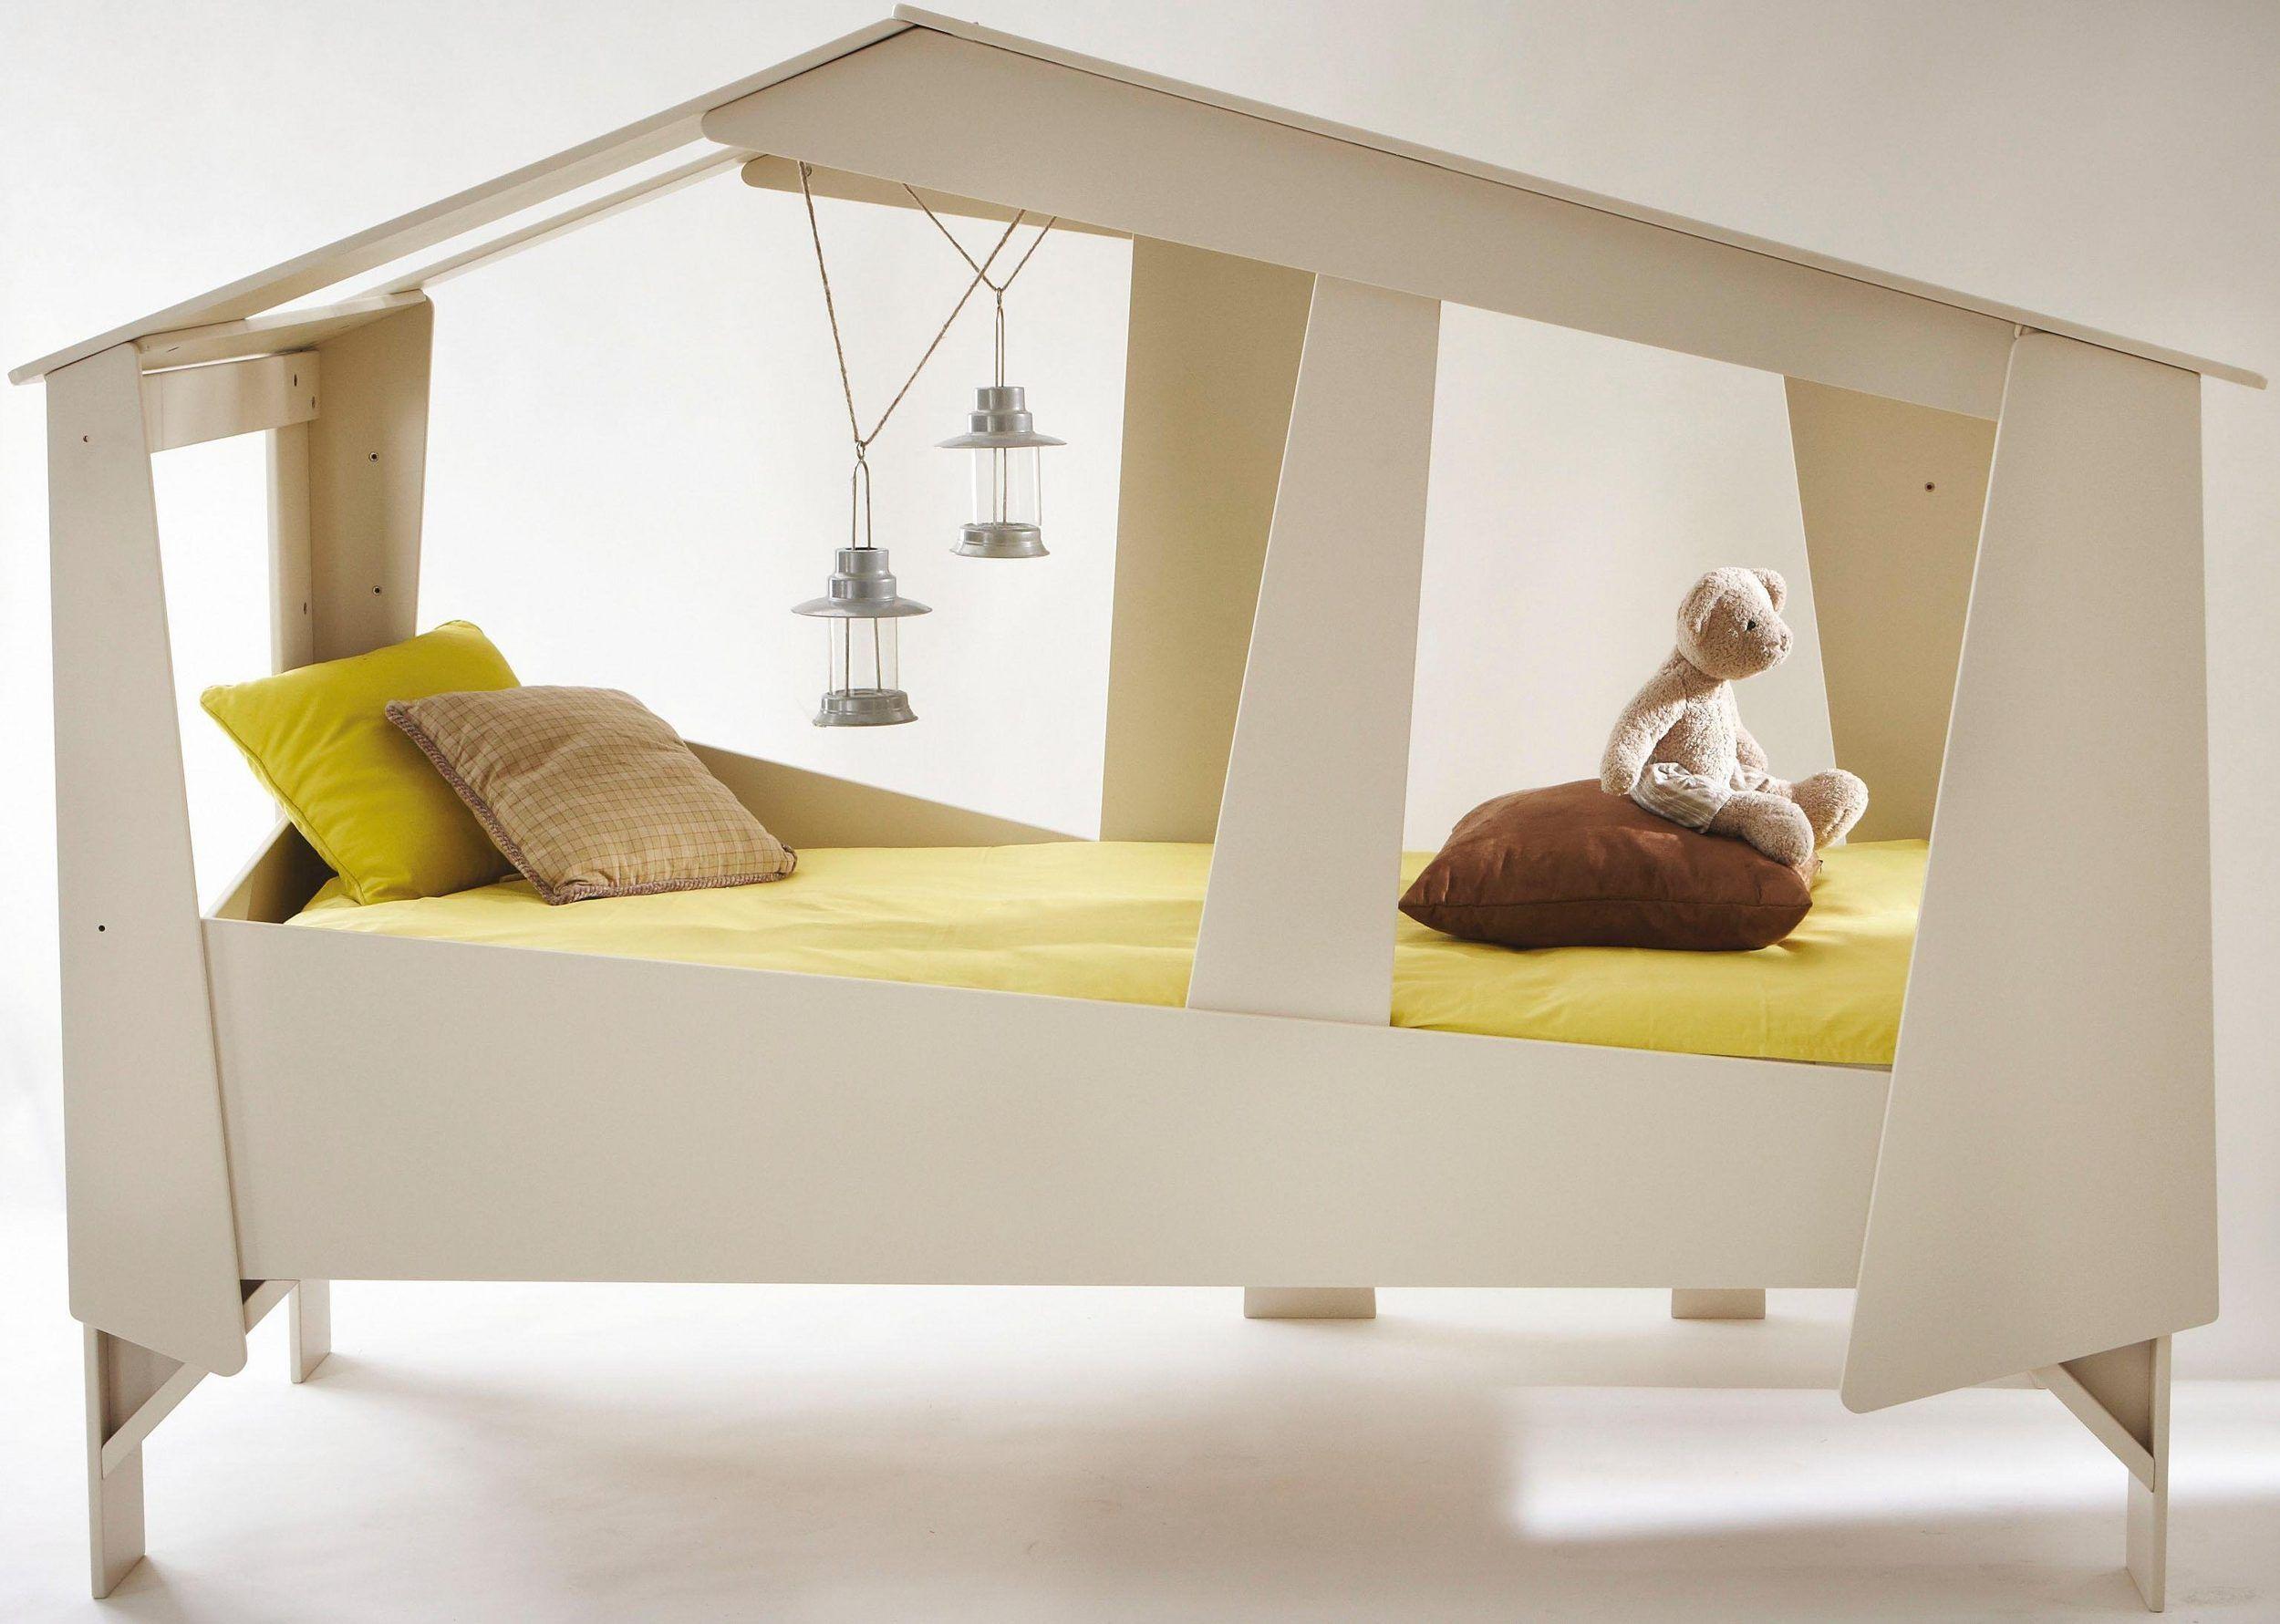 Demeyere Kinderbett Im Baumhausdesign Kaufen Otto Kinderbett Bett Ideen Kinder Bett